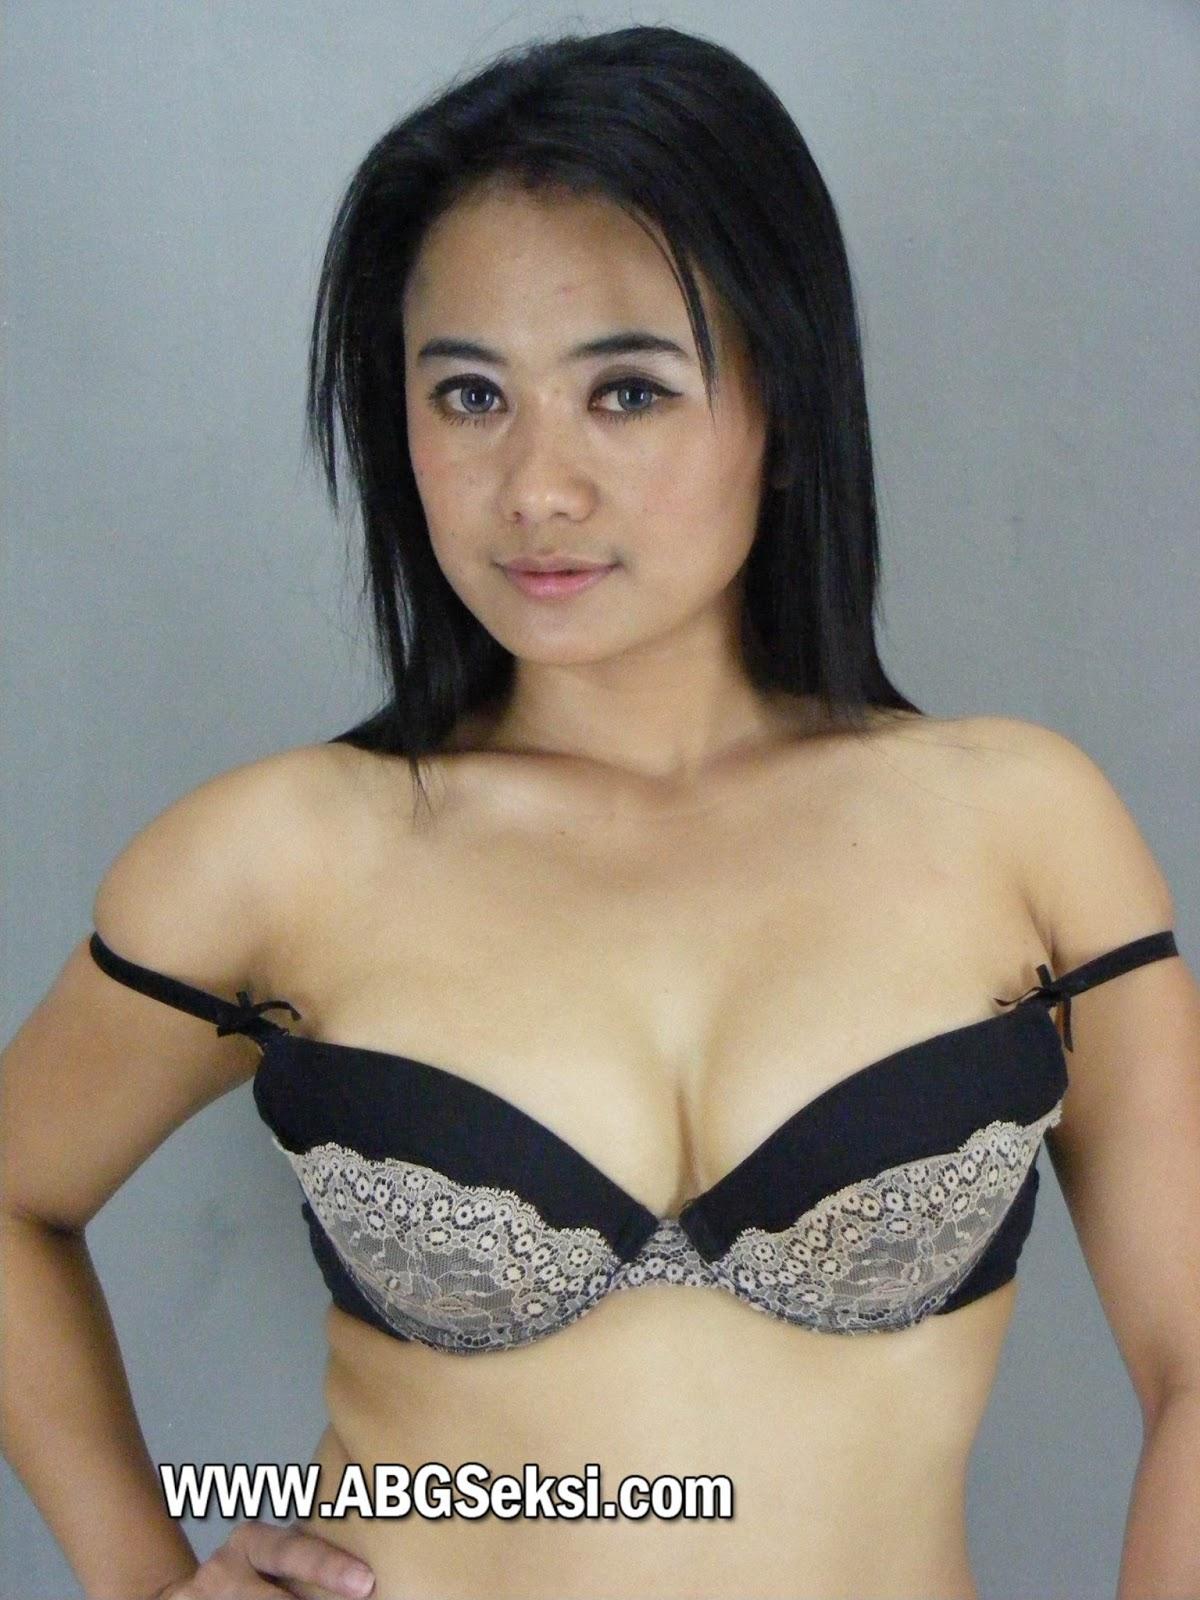 kumpulan casting jadi model indonesia telanjang abgseksi